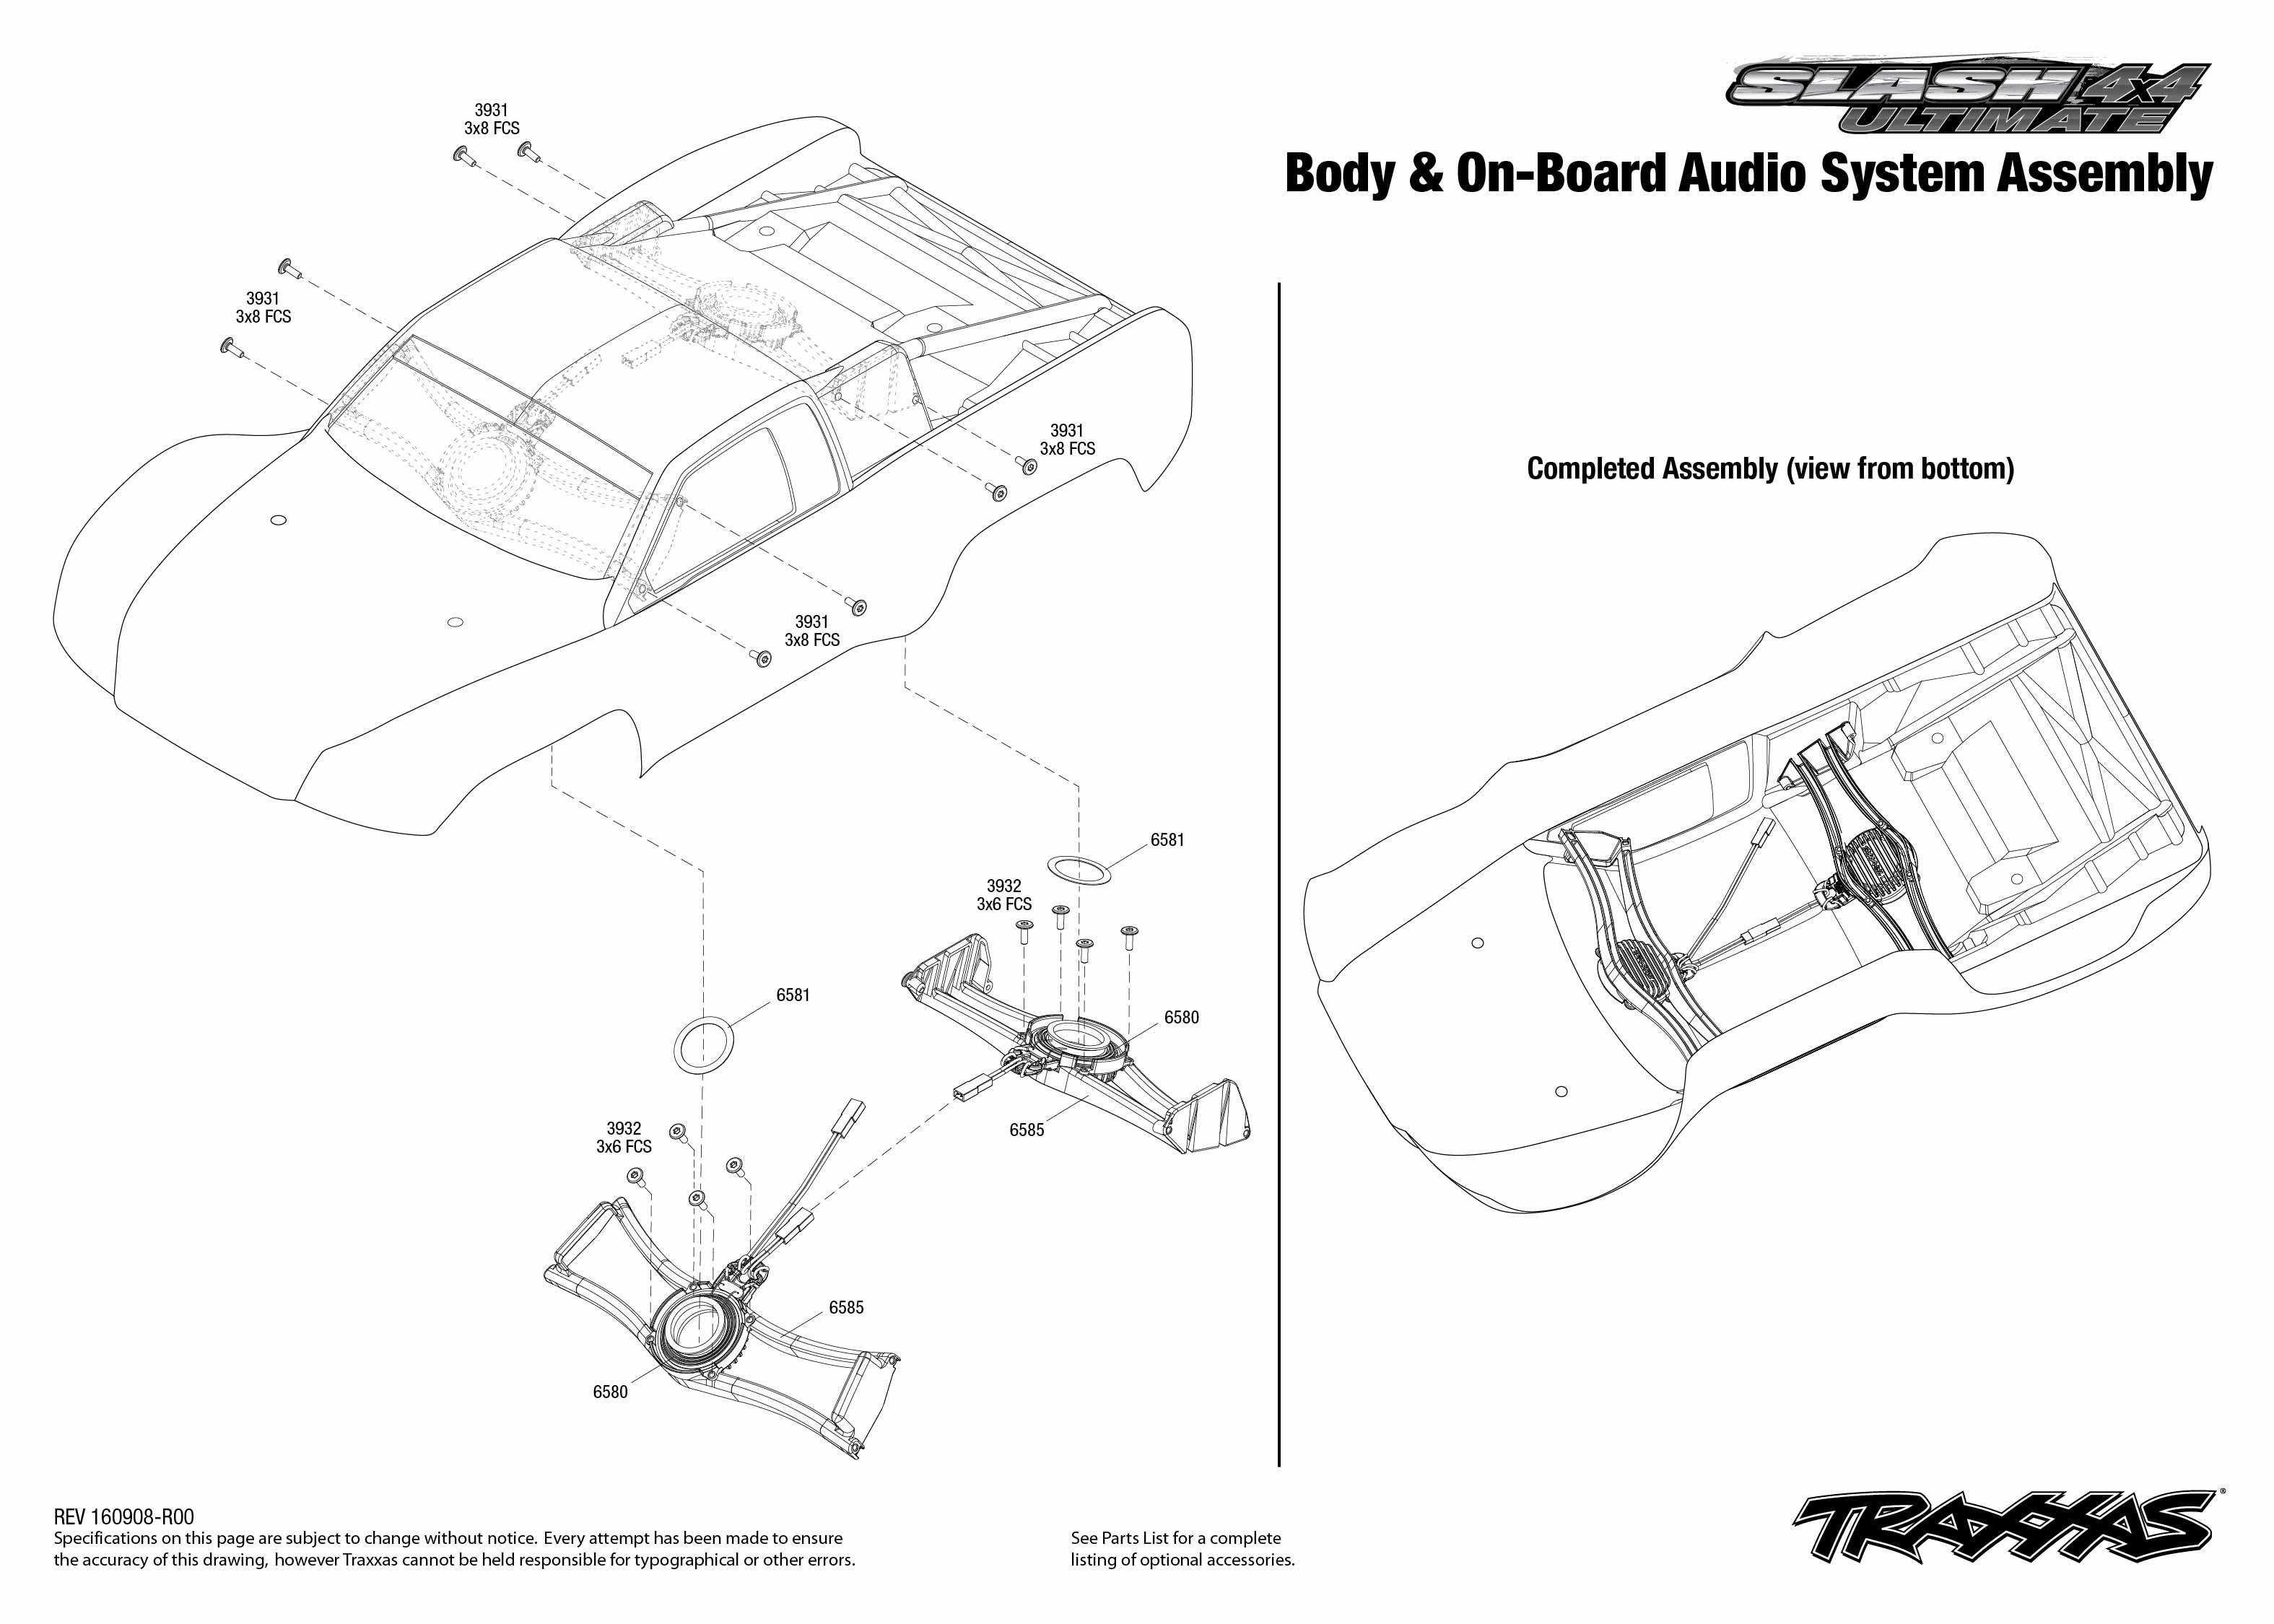 Slash 4X4 Ultimate (68077-24) Body & On-Board Audio System